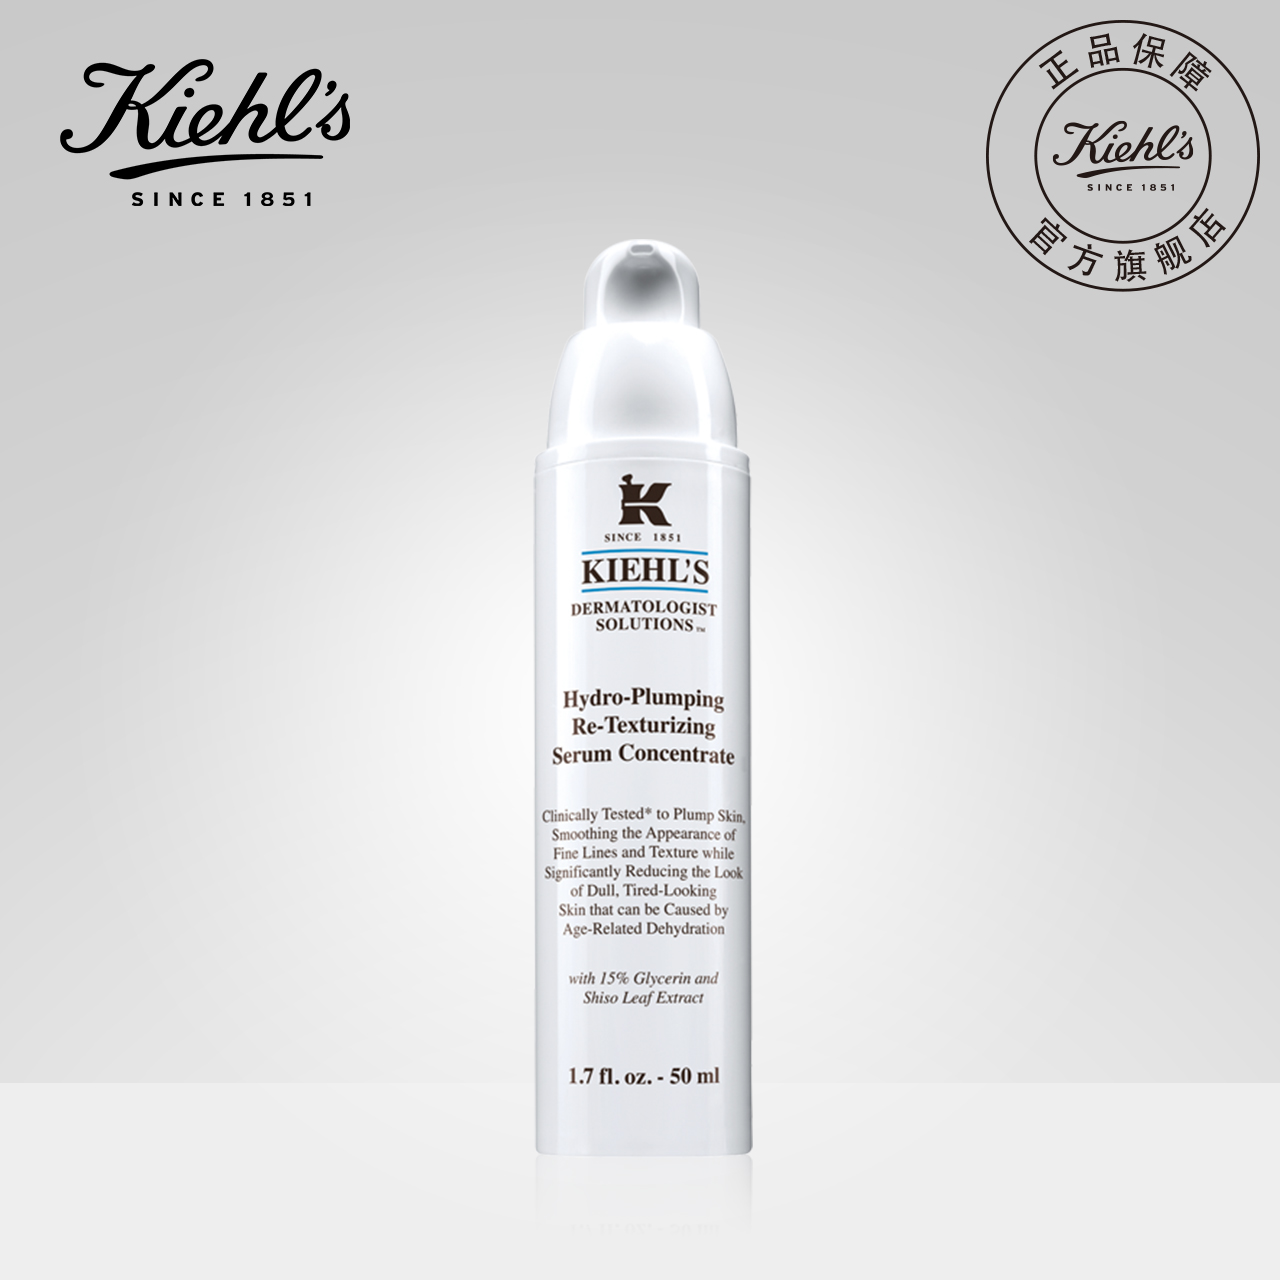 Kiehl's科颜氏丰润保湿水凝精华乳50ml 补水保湿缓解干纹